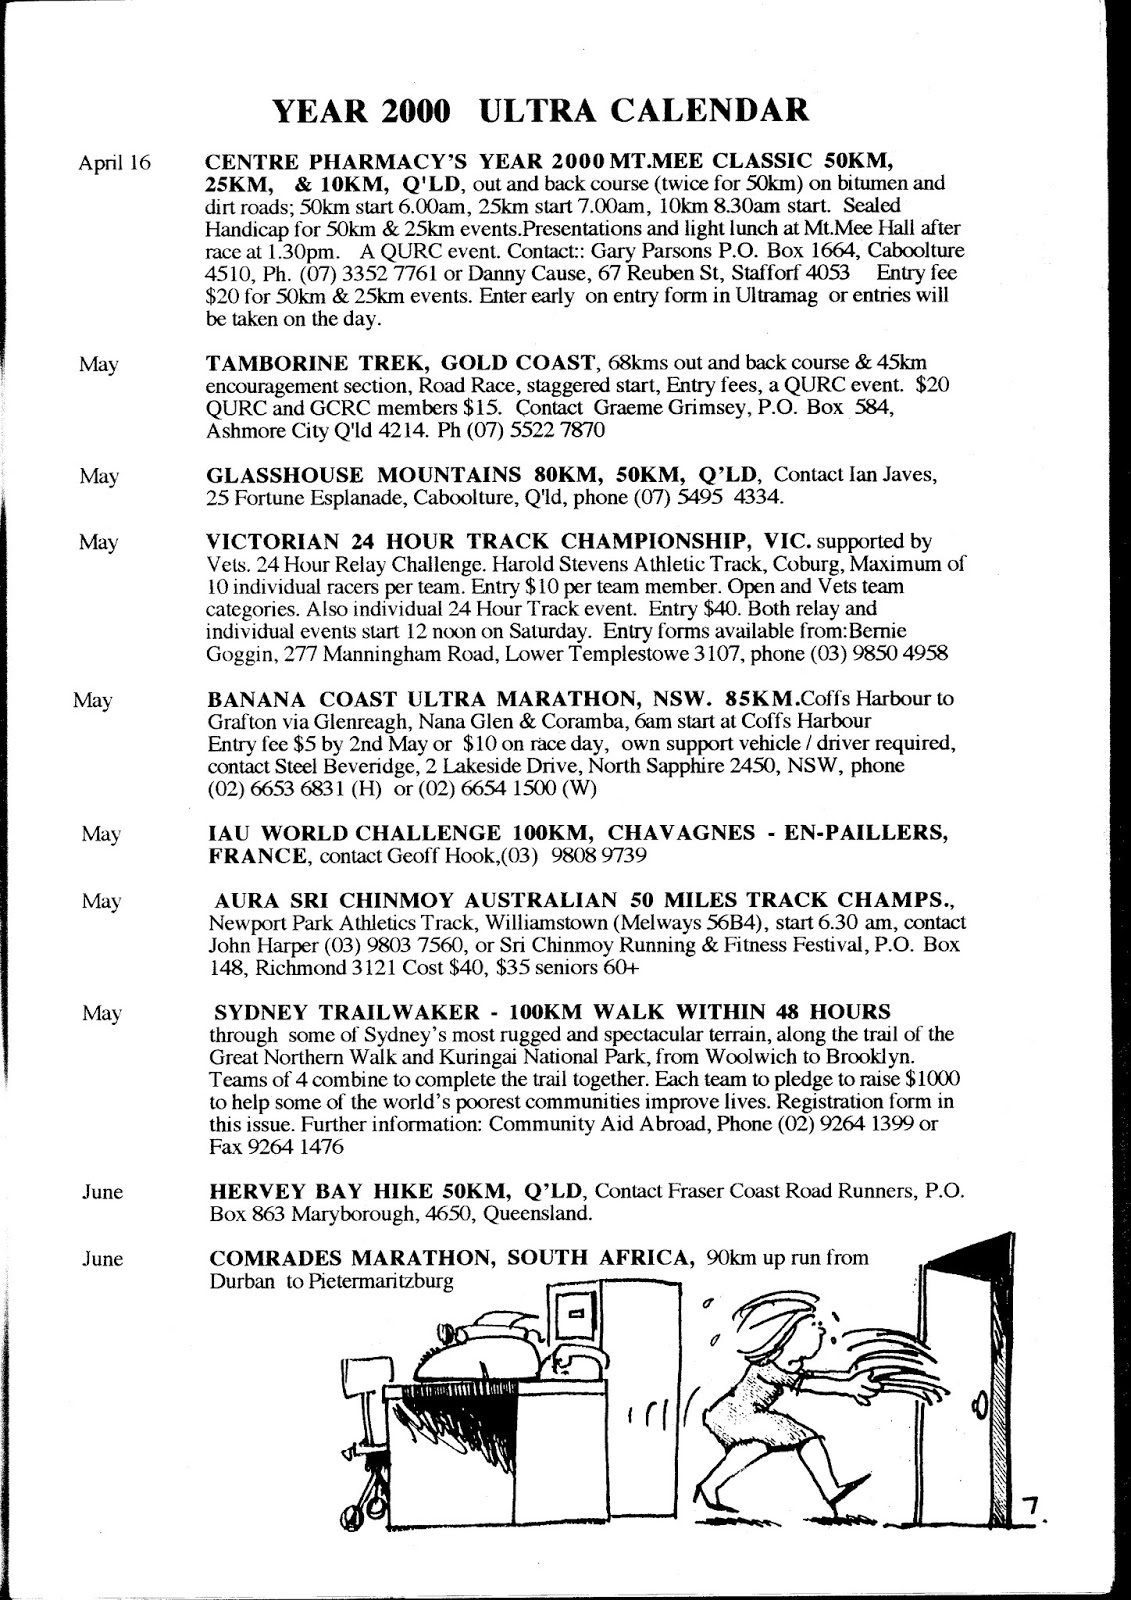 Australian Ultramarathon History Aura Ultra Calendar June 1999 2000